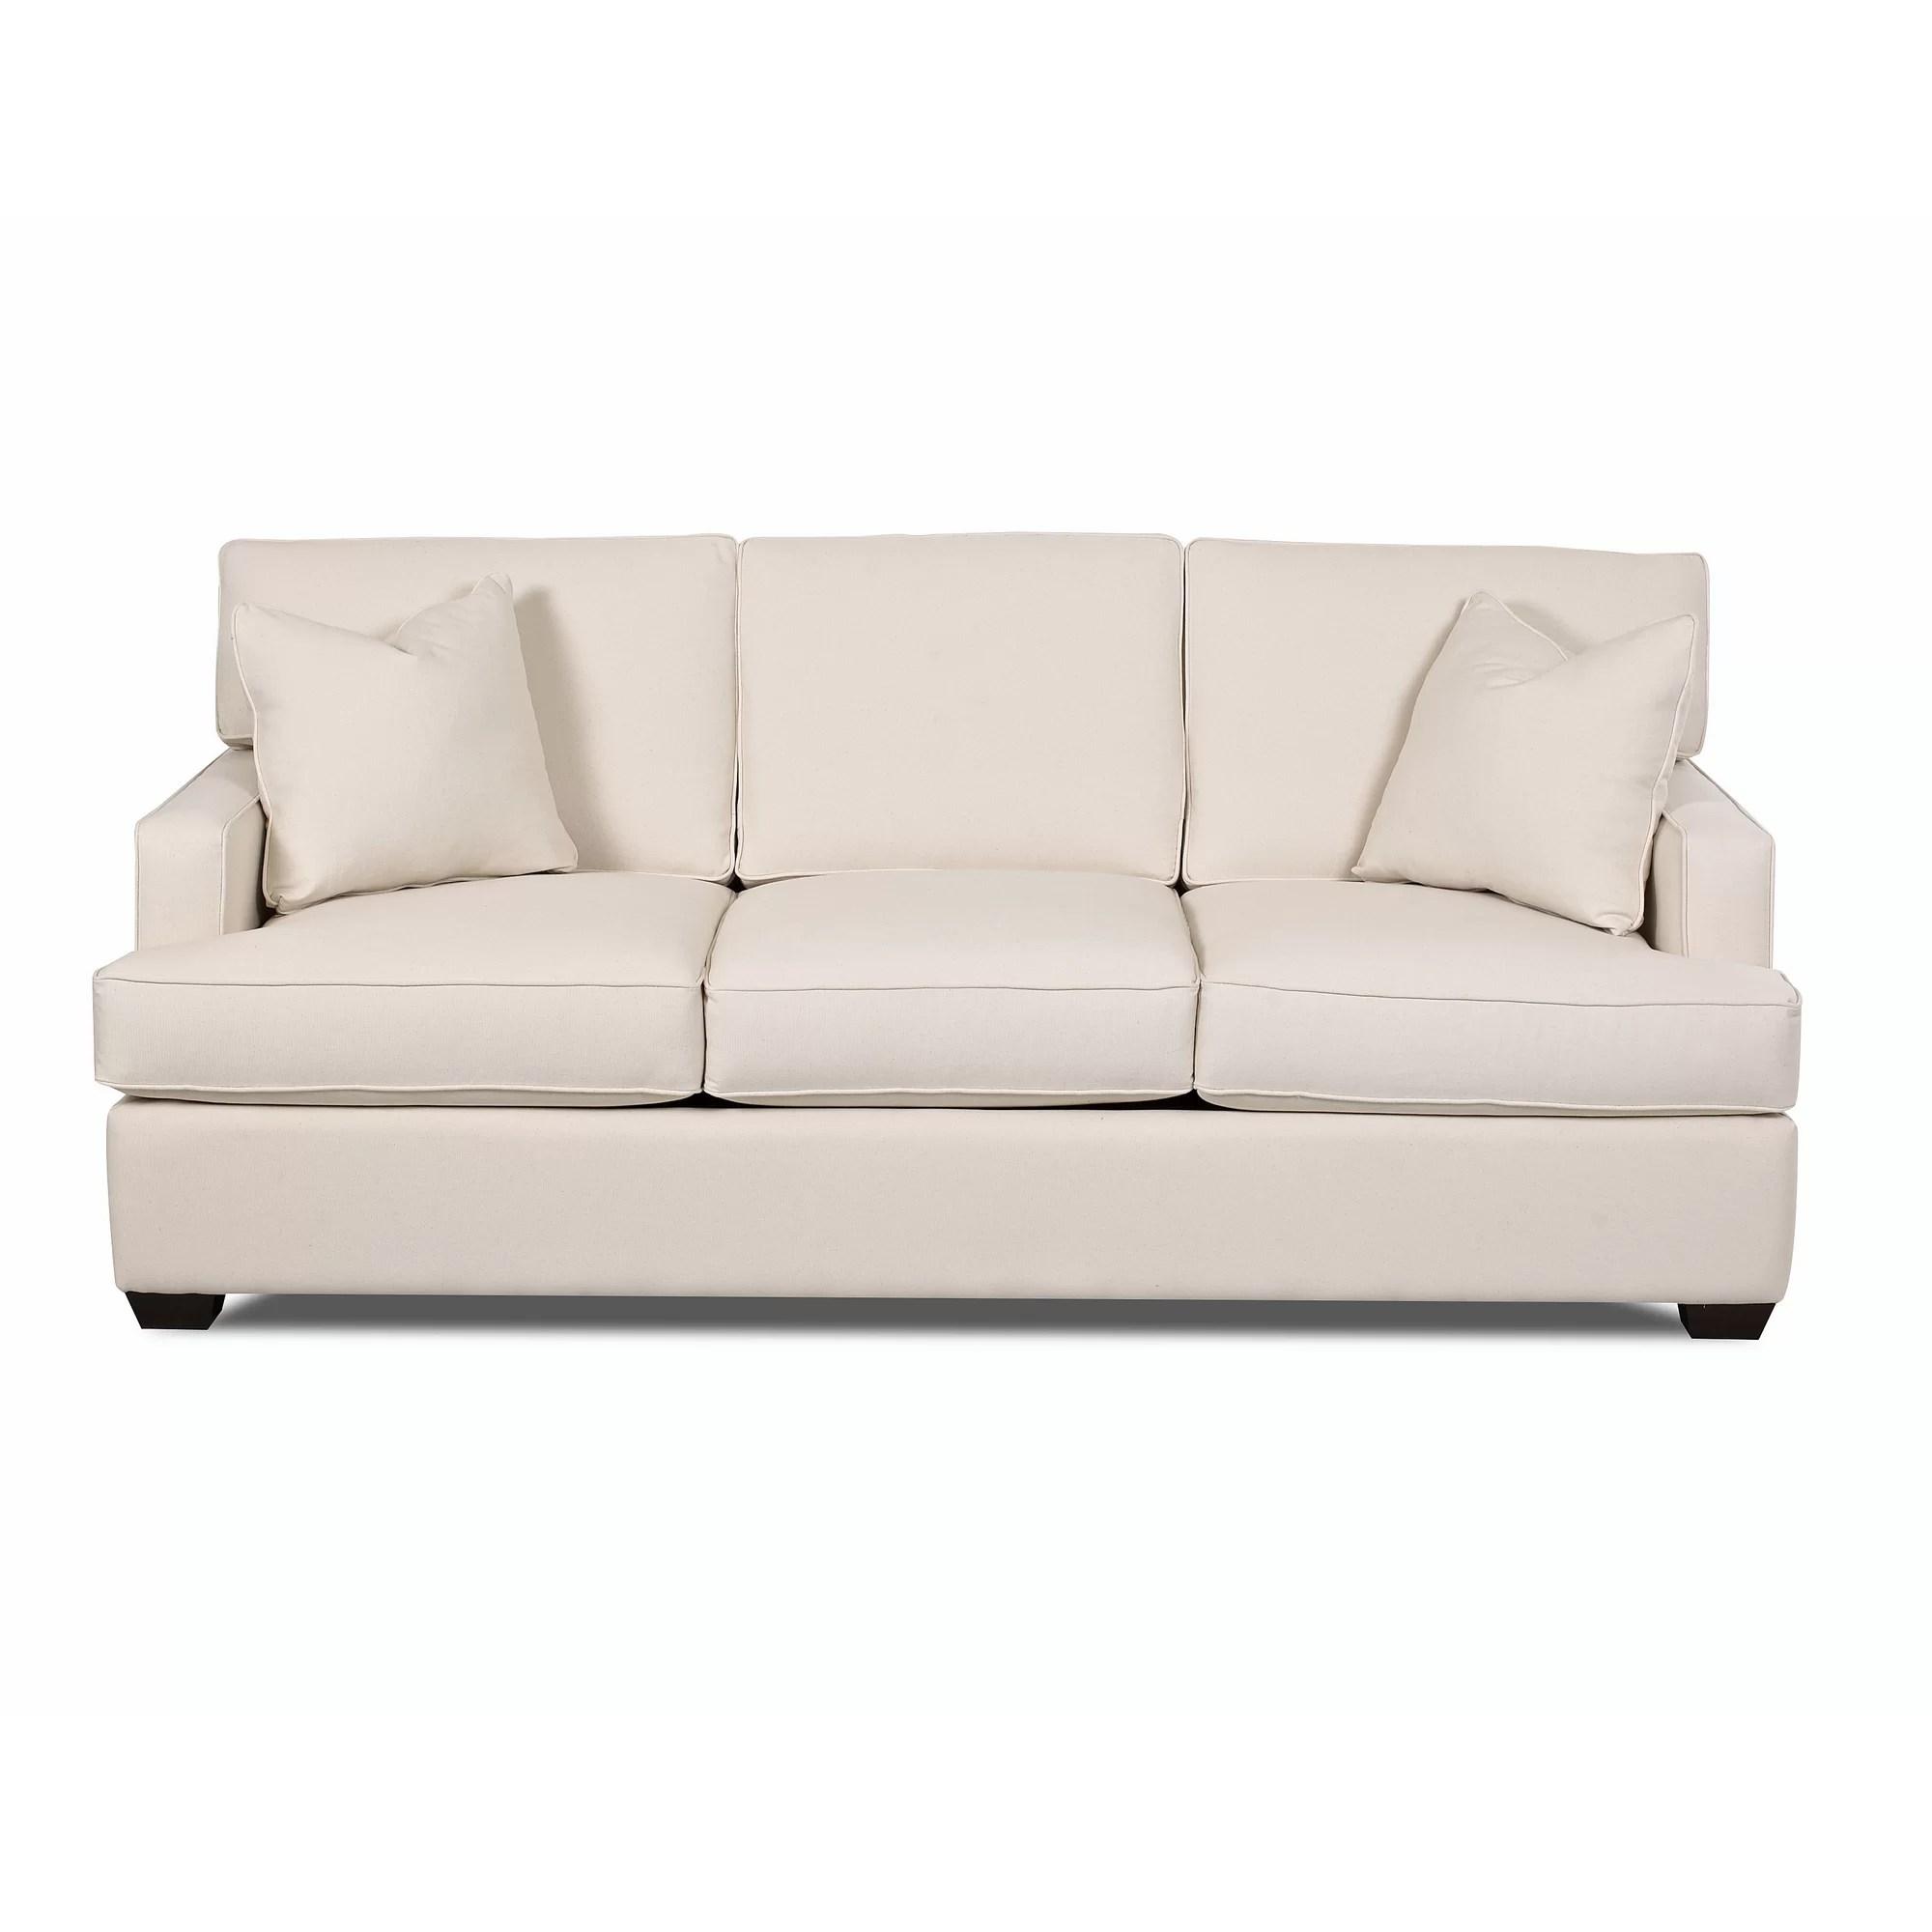 Sleeper Sofas For Sale Wayfair